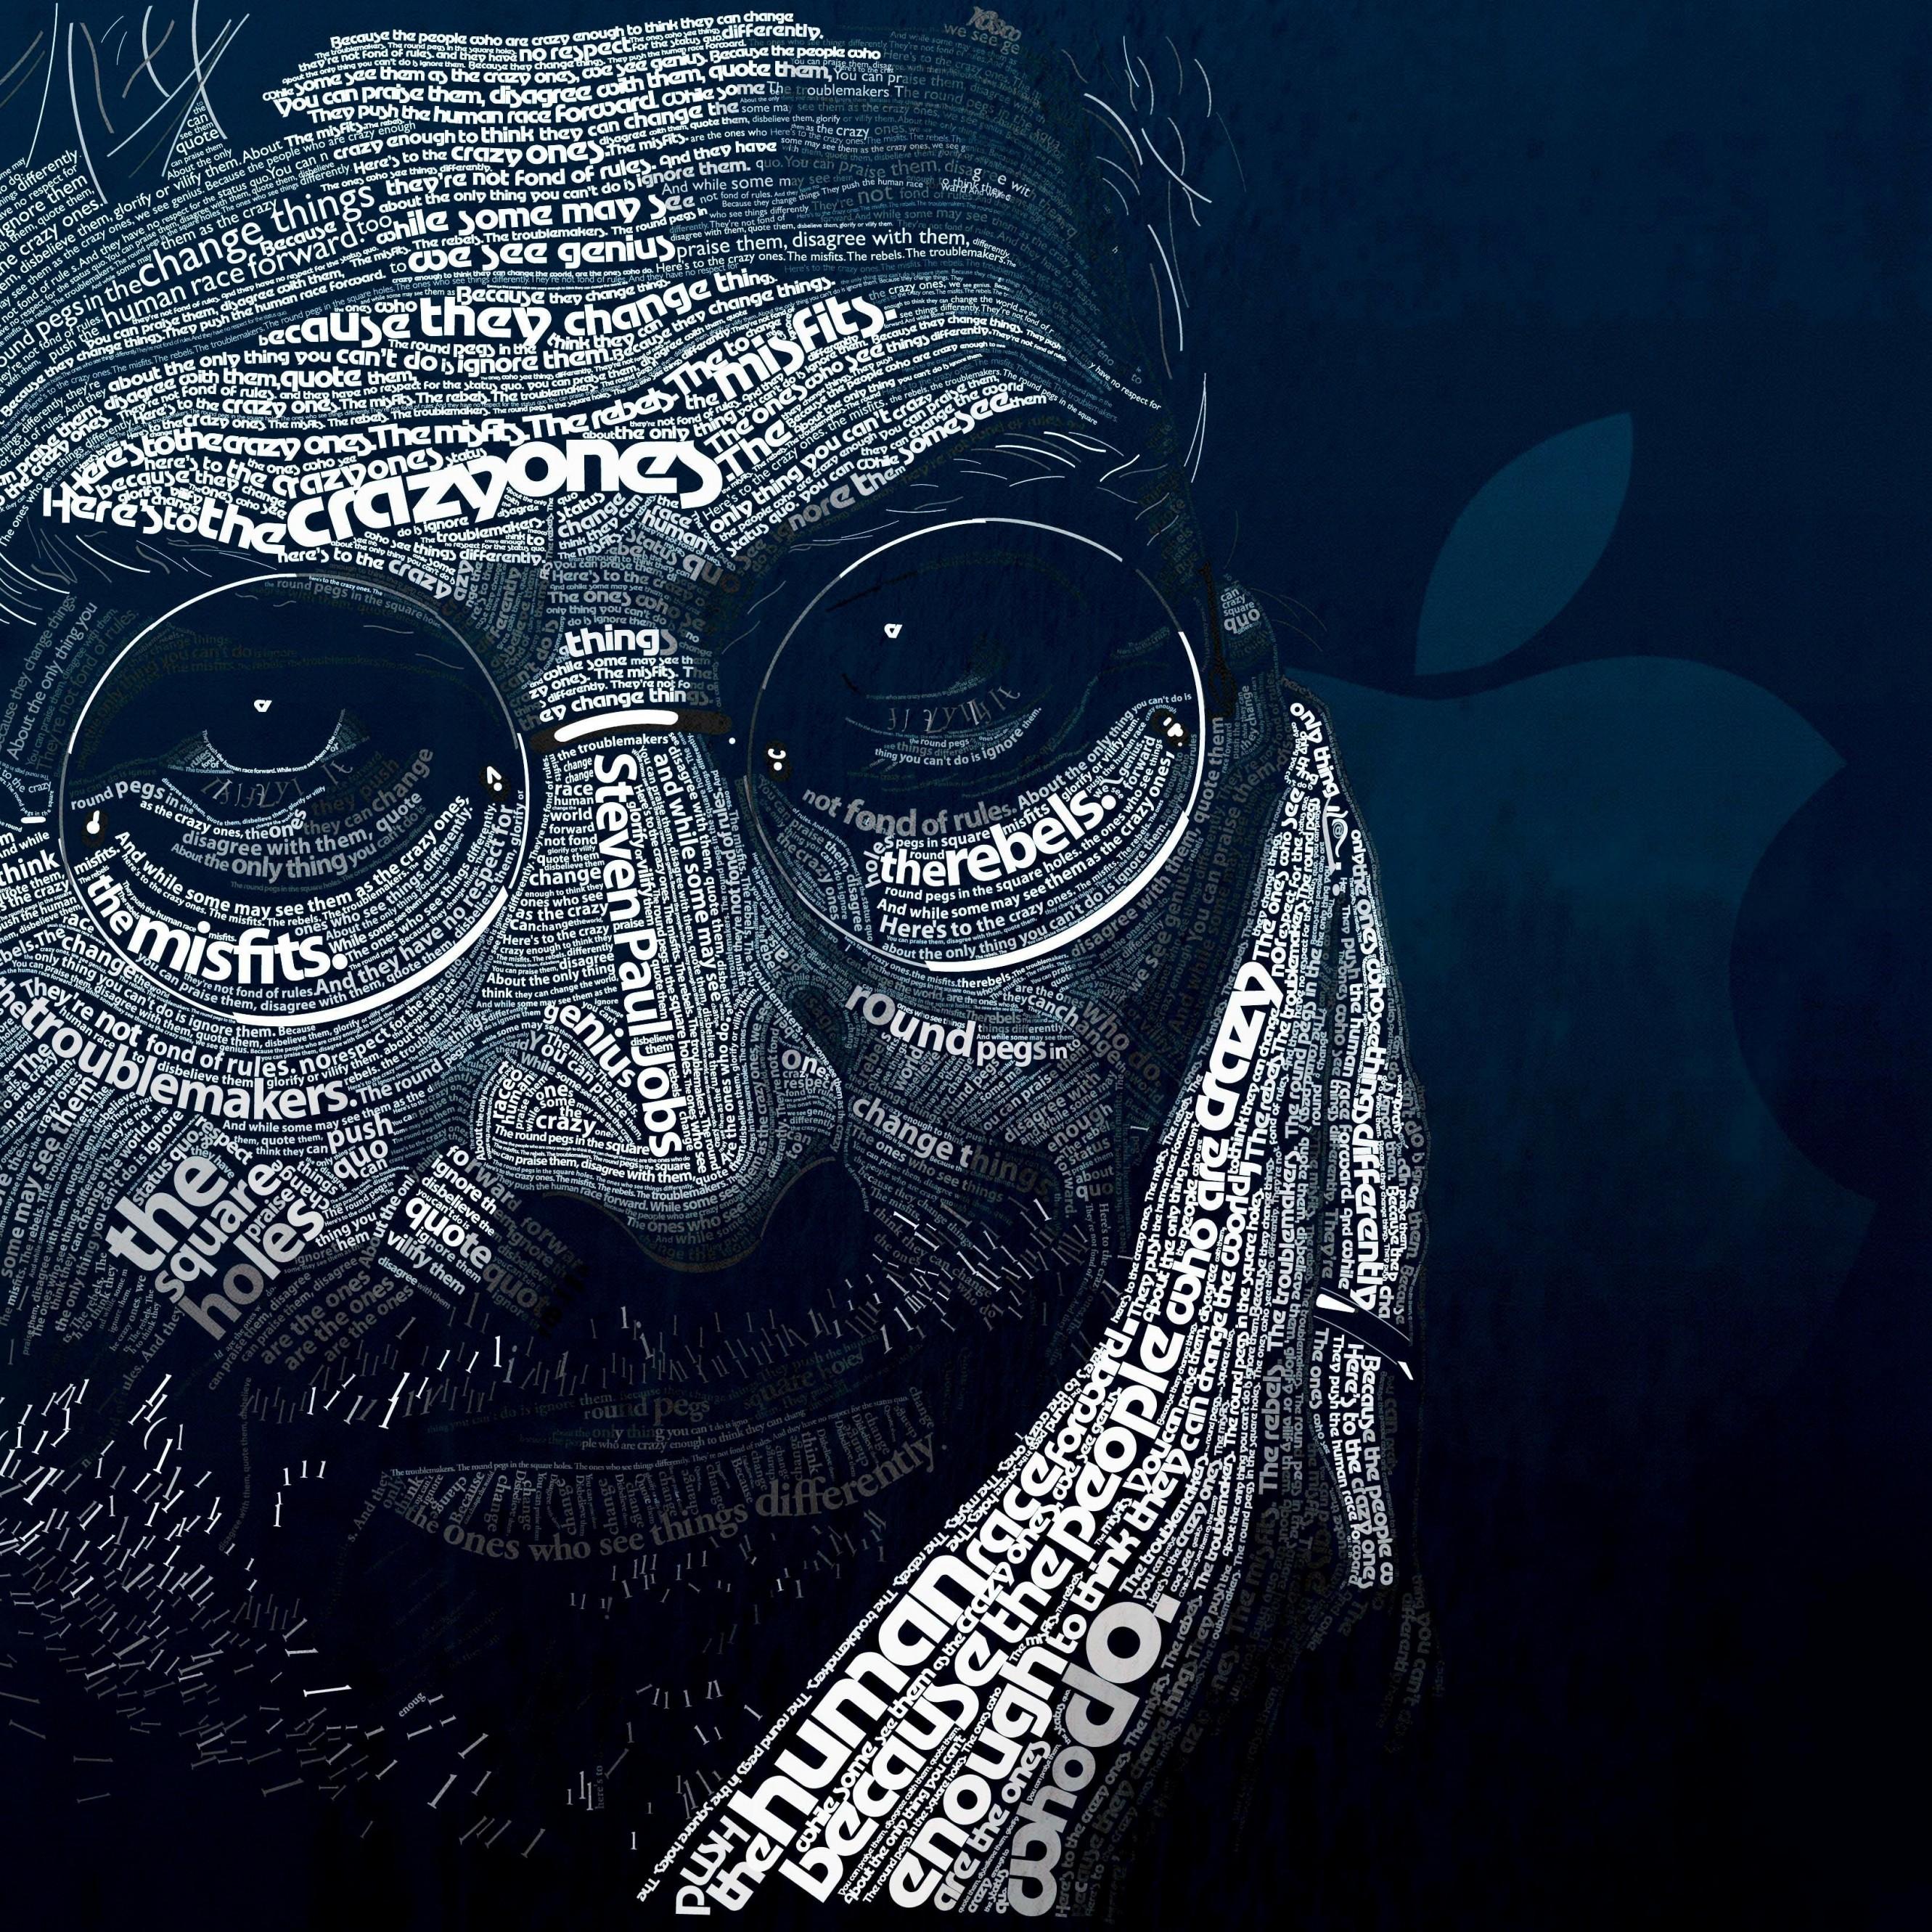 Portrait Wallpaper: Steve Jobs Typographic Portrait HD Wallpaper For IPhone 6